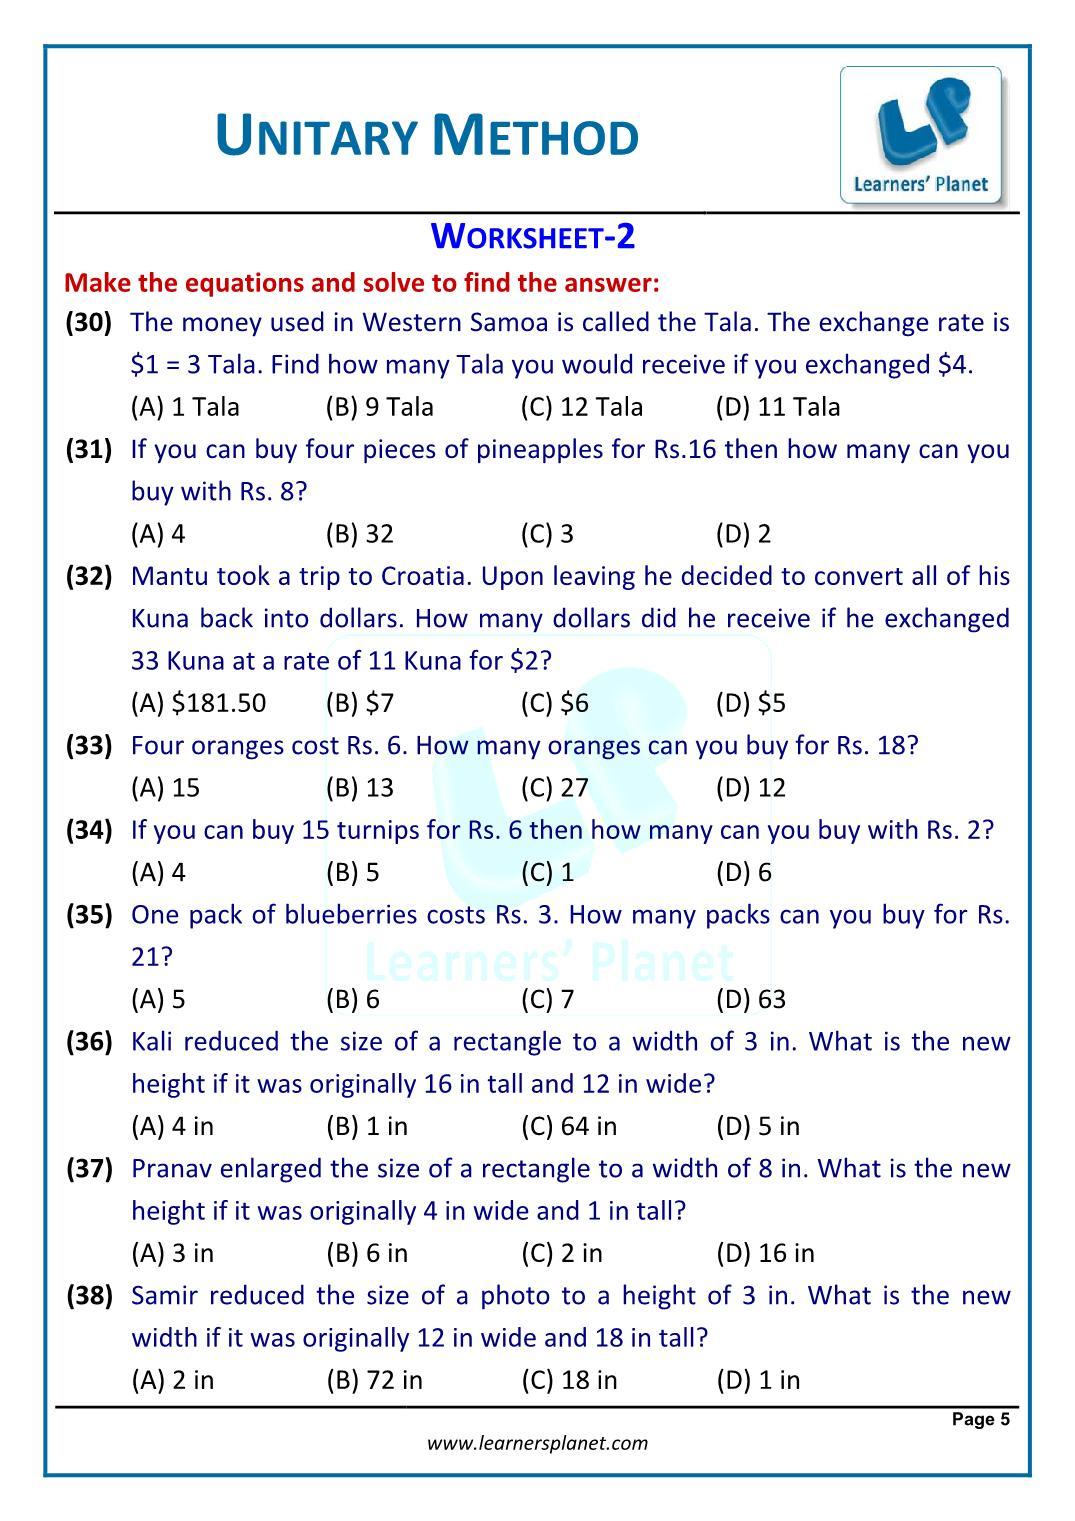 Problems using unitary method worksheets